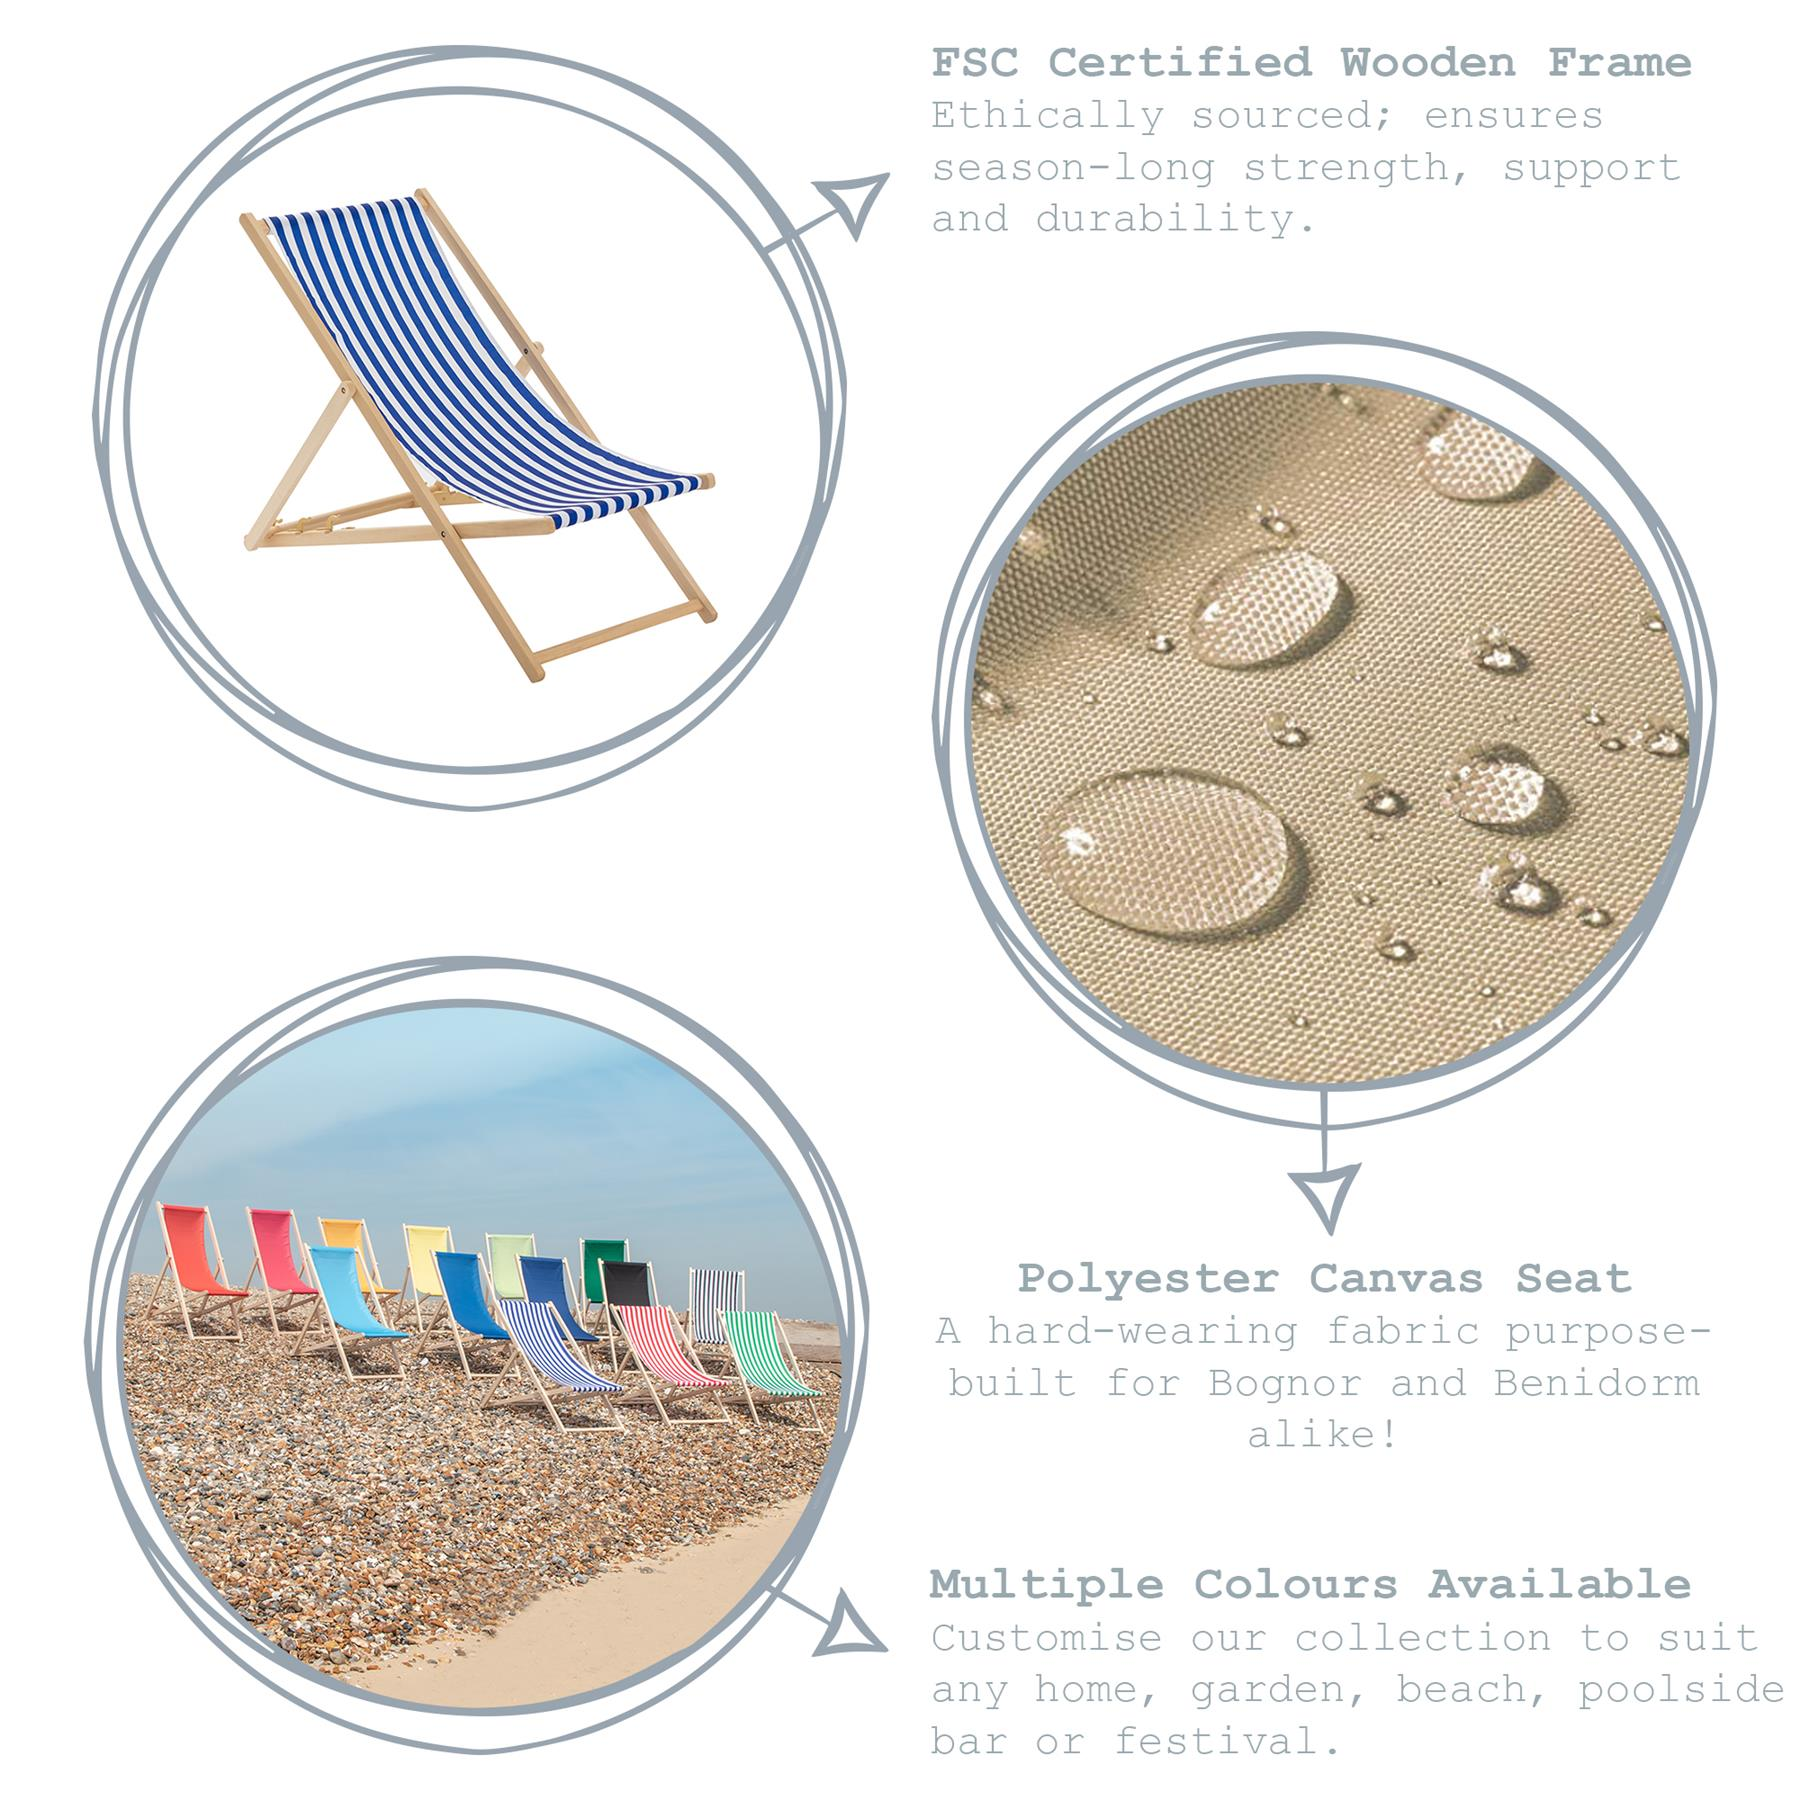 Wooden Deck Chair Folding Garden Beach Seaside Deckchair Green White Stripe x1